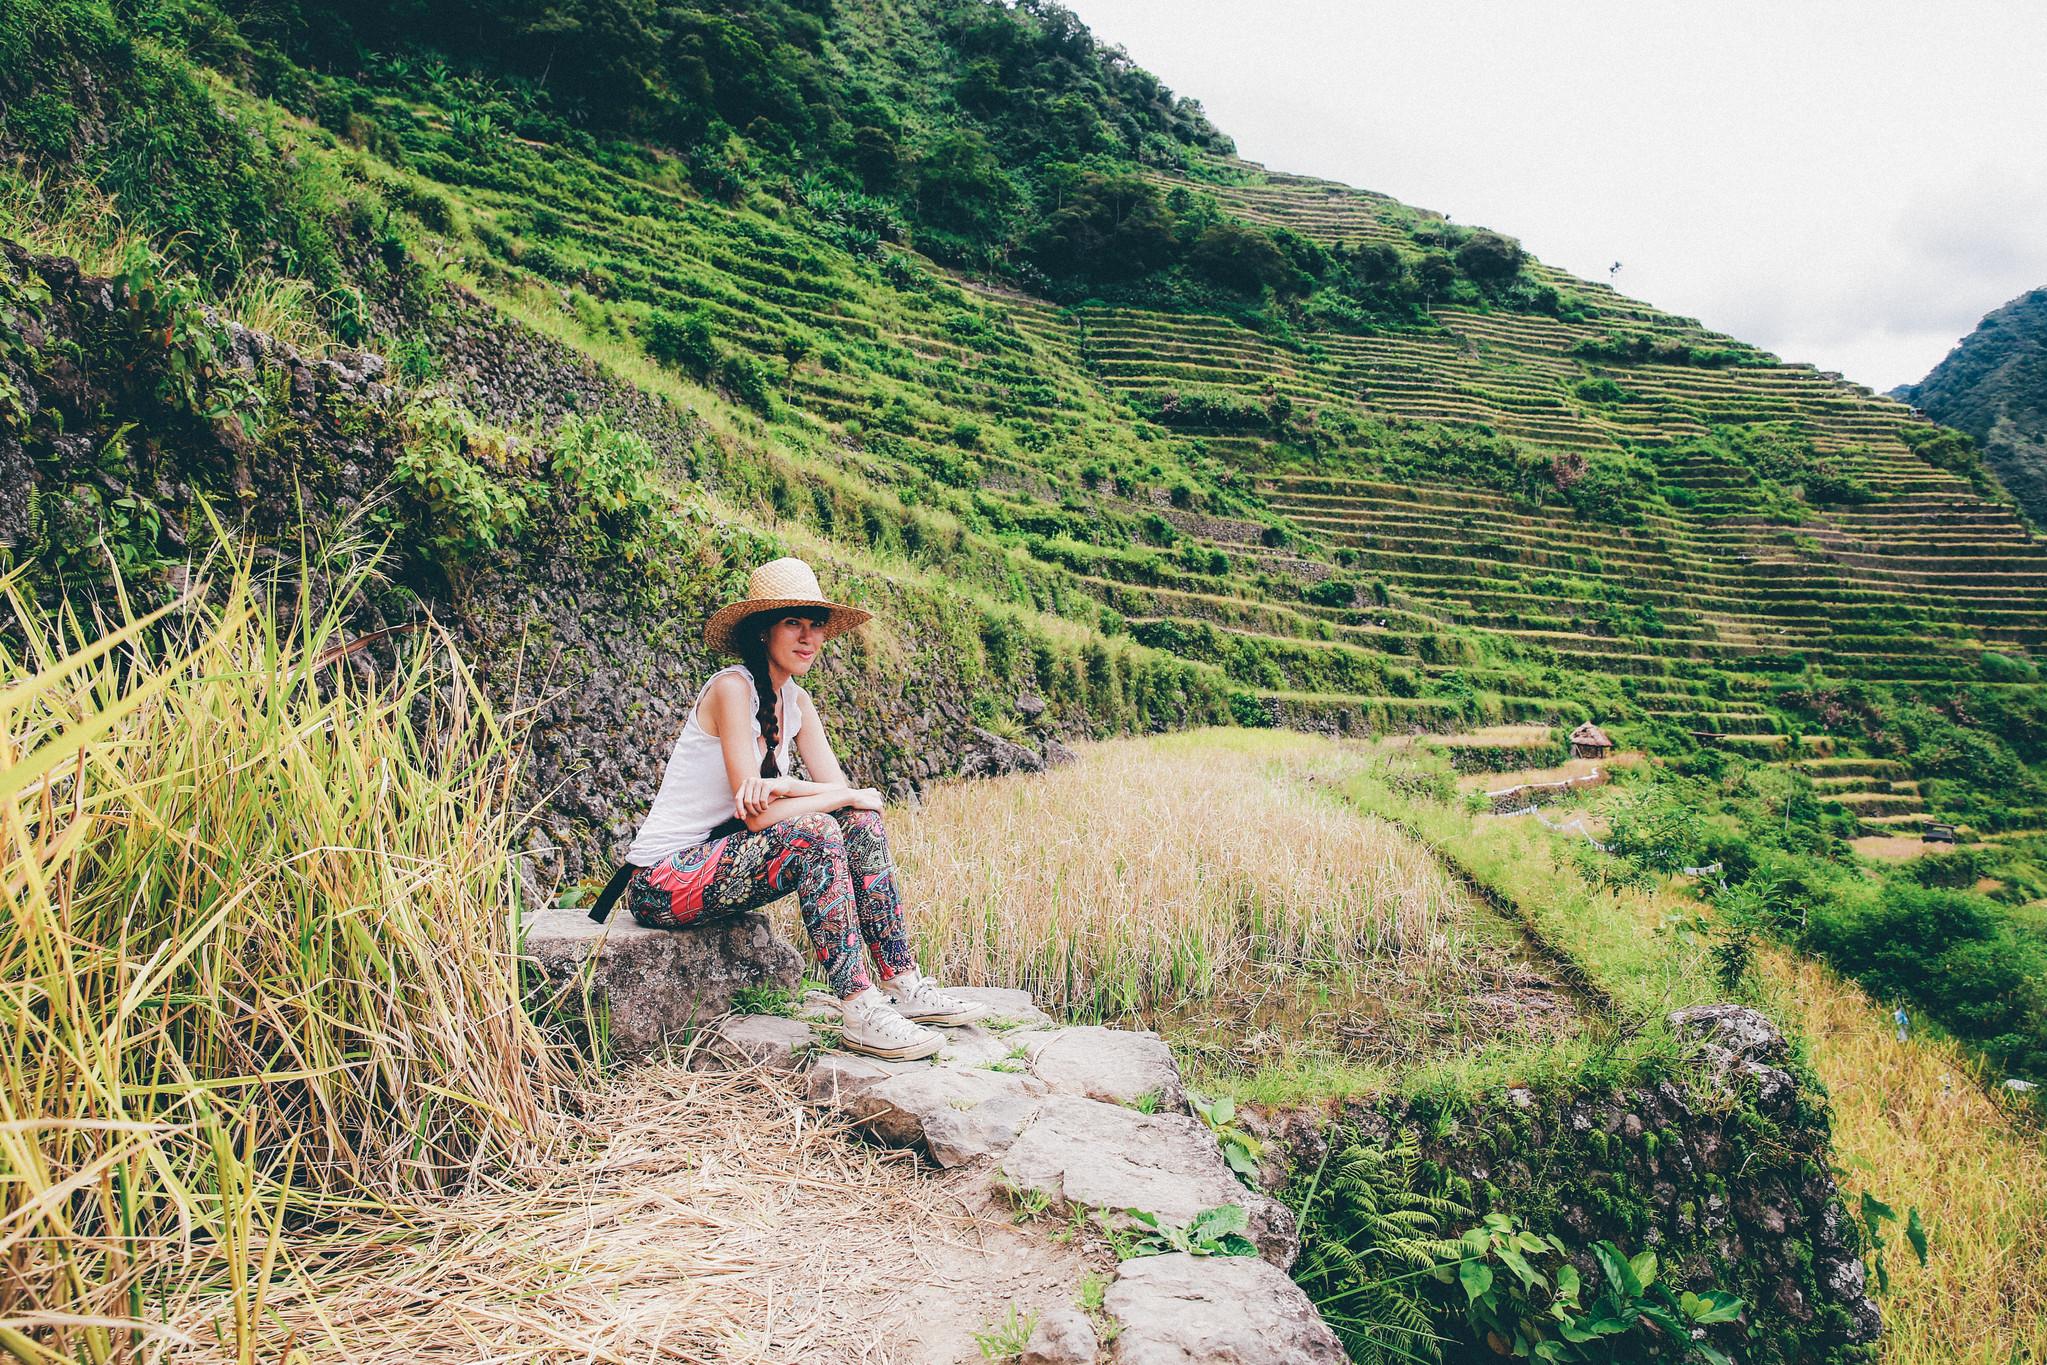 Travel to the Philippines - Batad